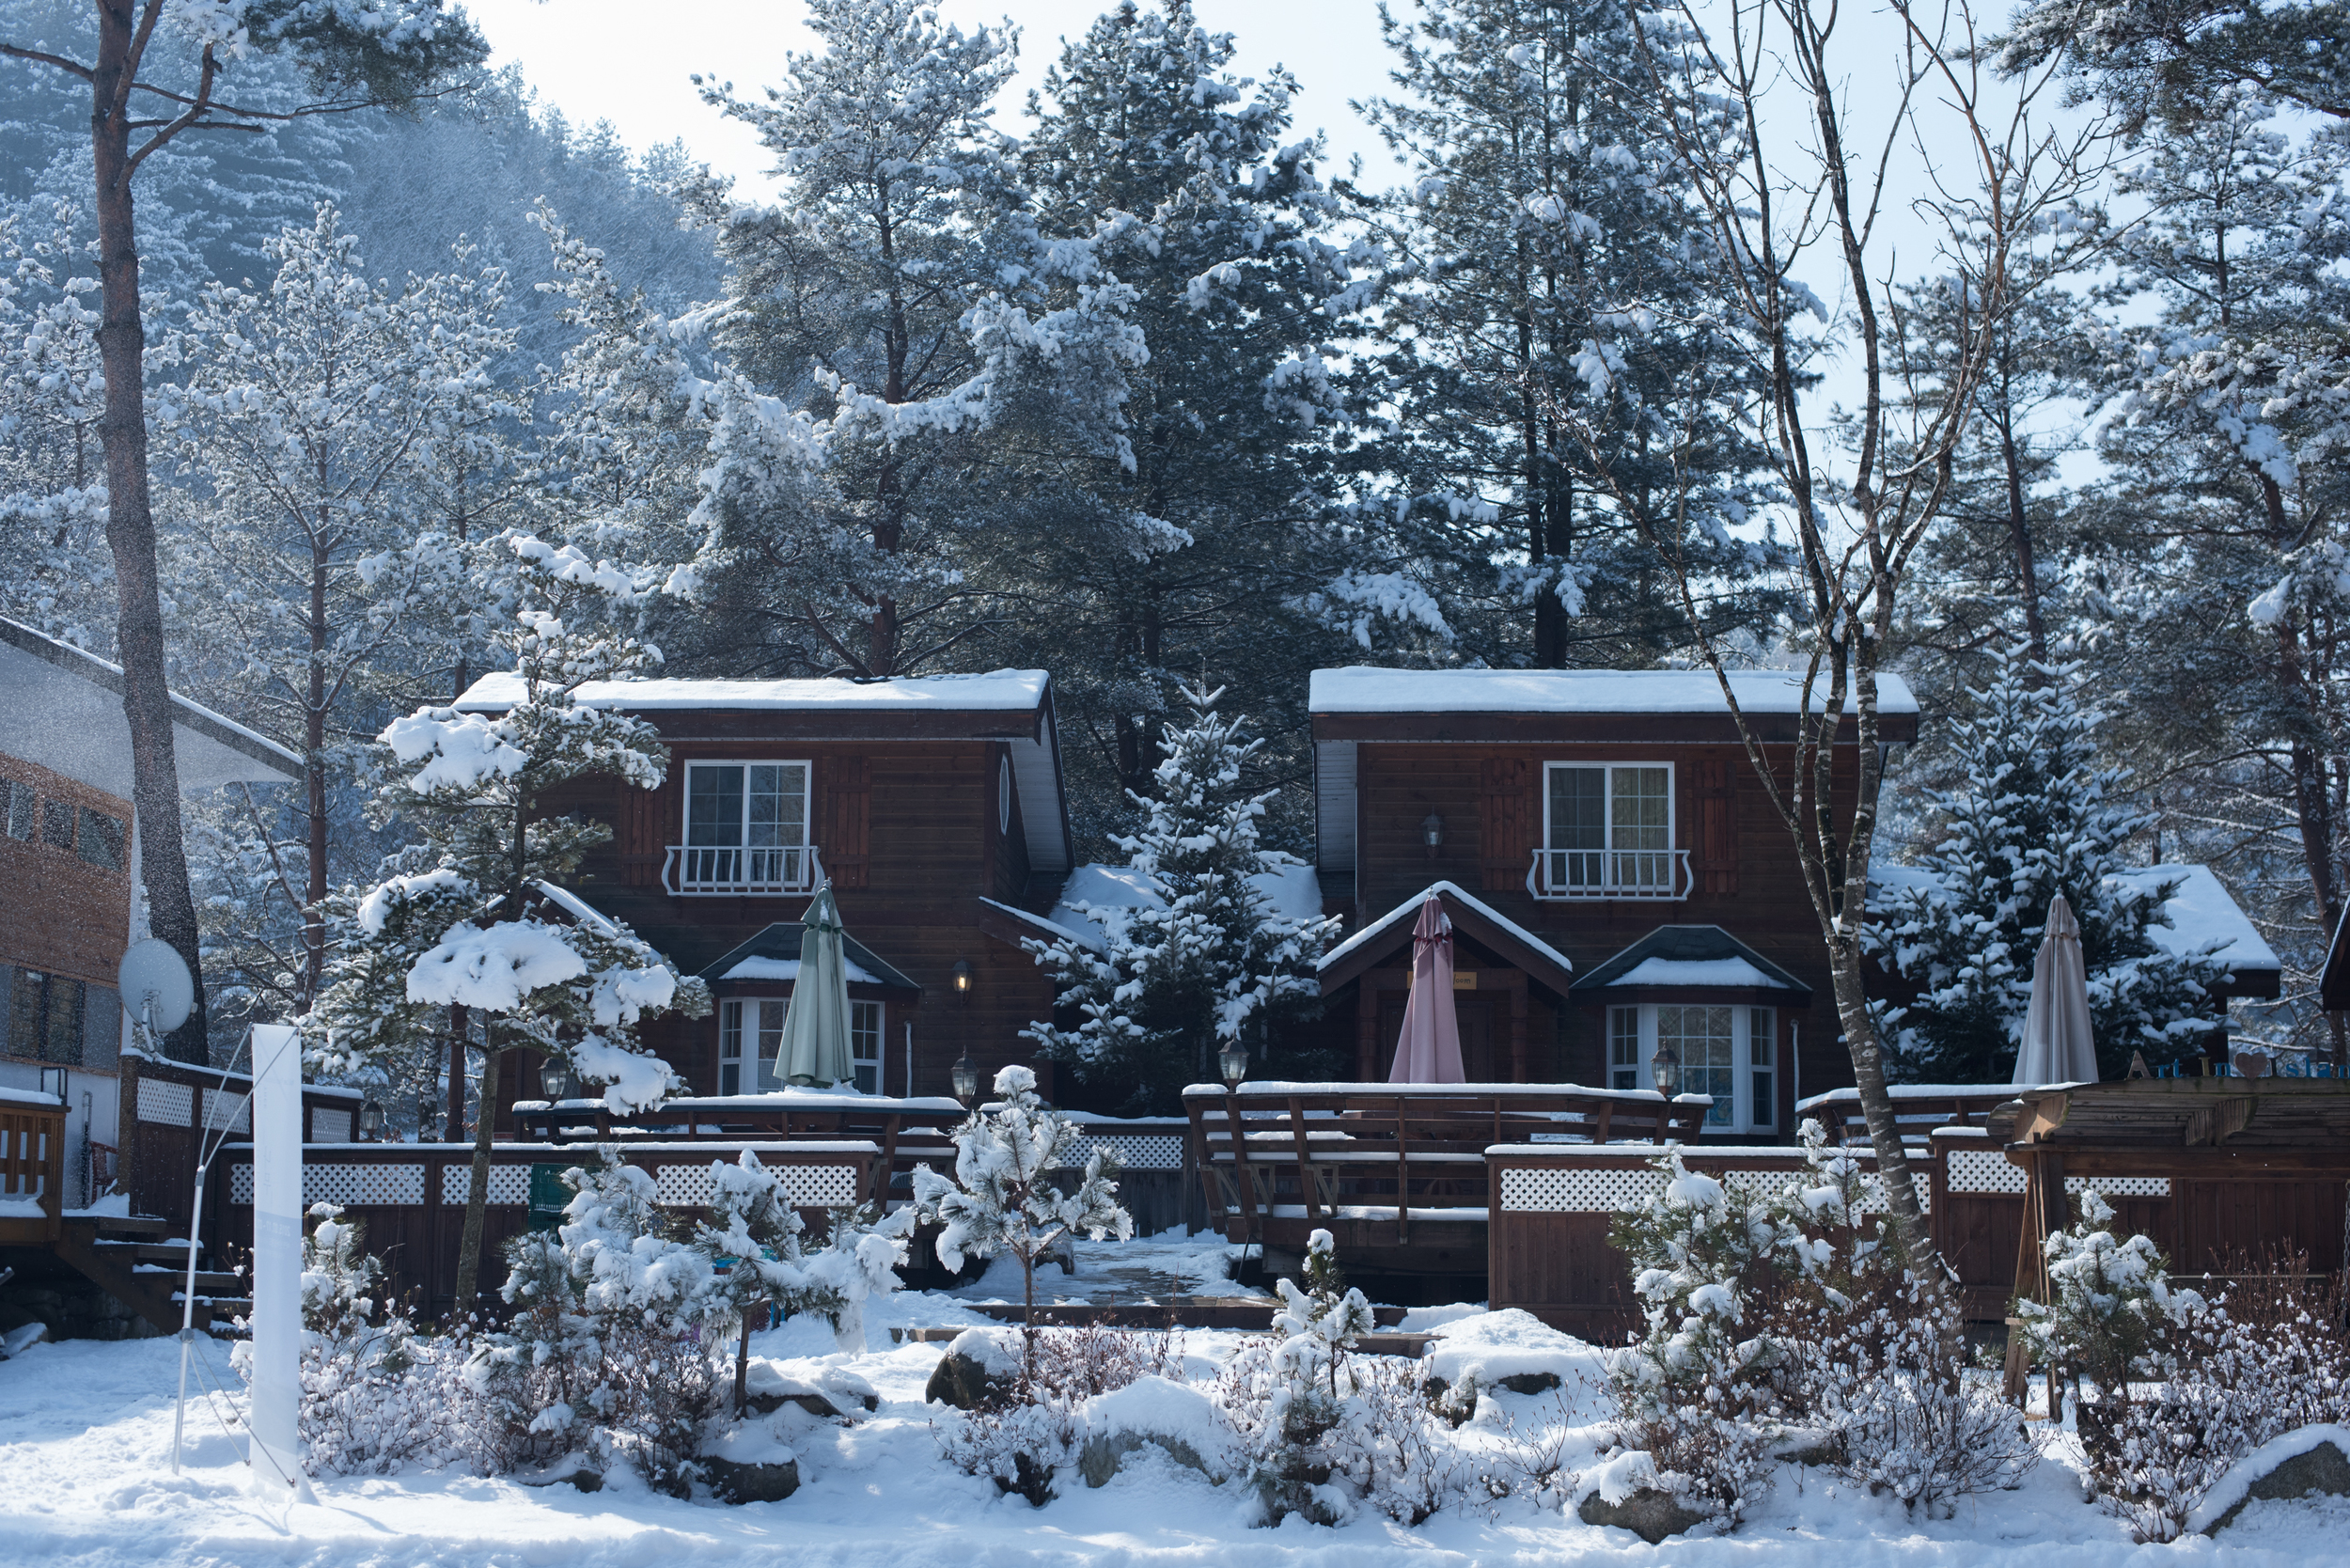 ArtInIslandPyeongChangDogFriendly Wooden Cabin Korea (213 of 258).JPG